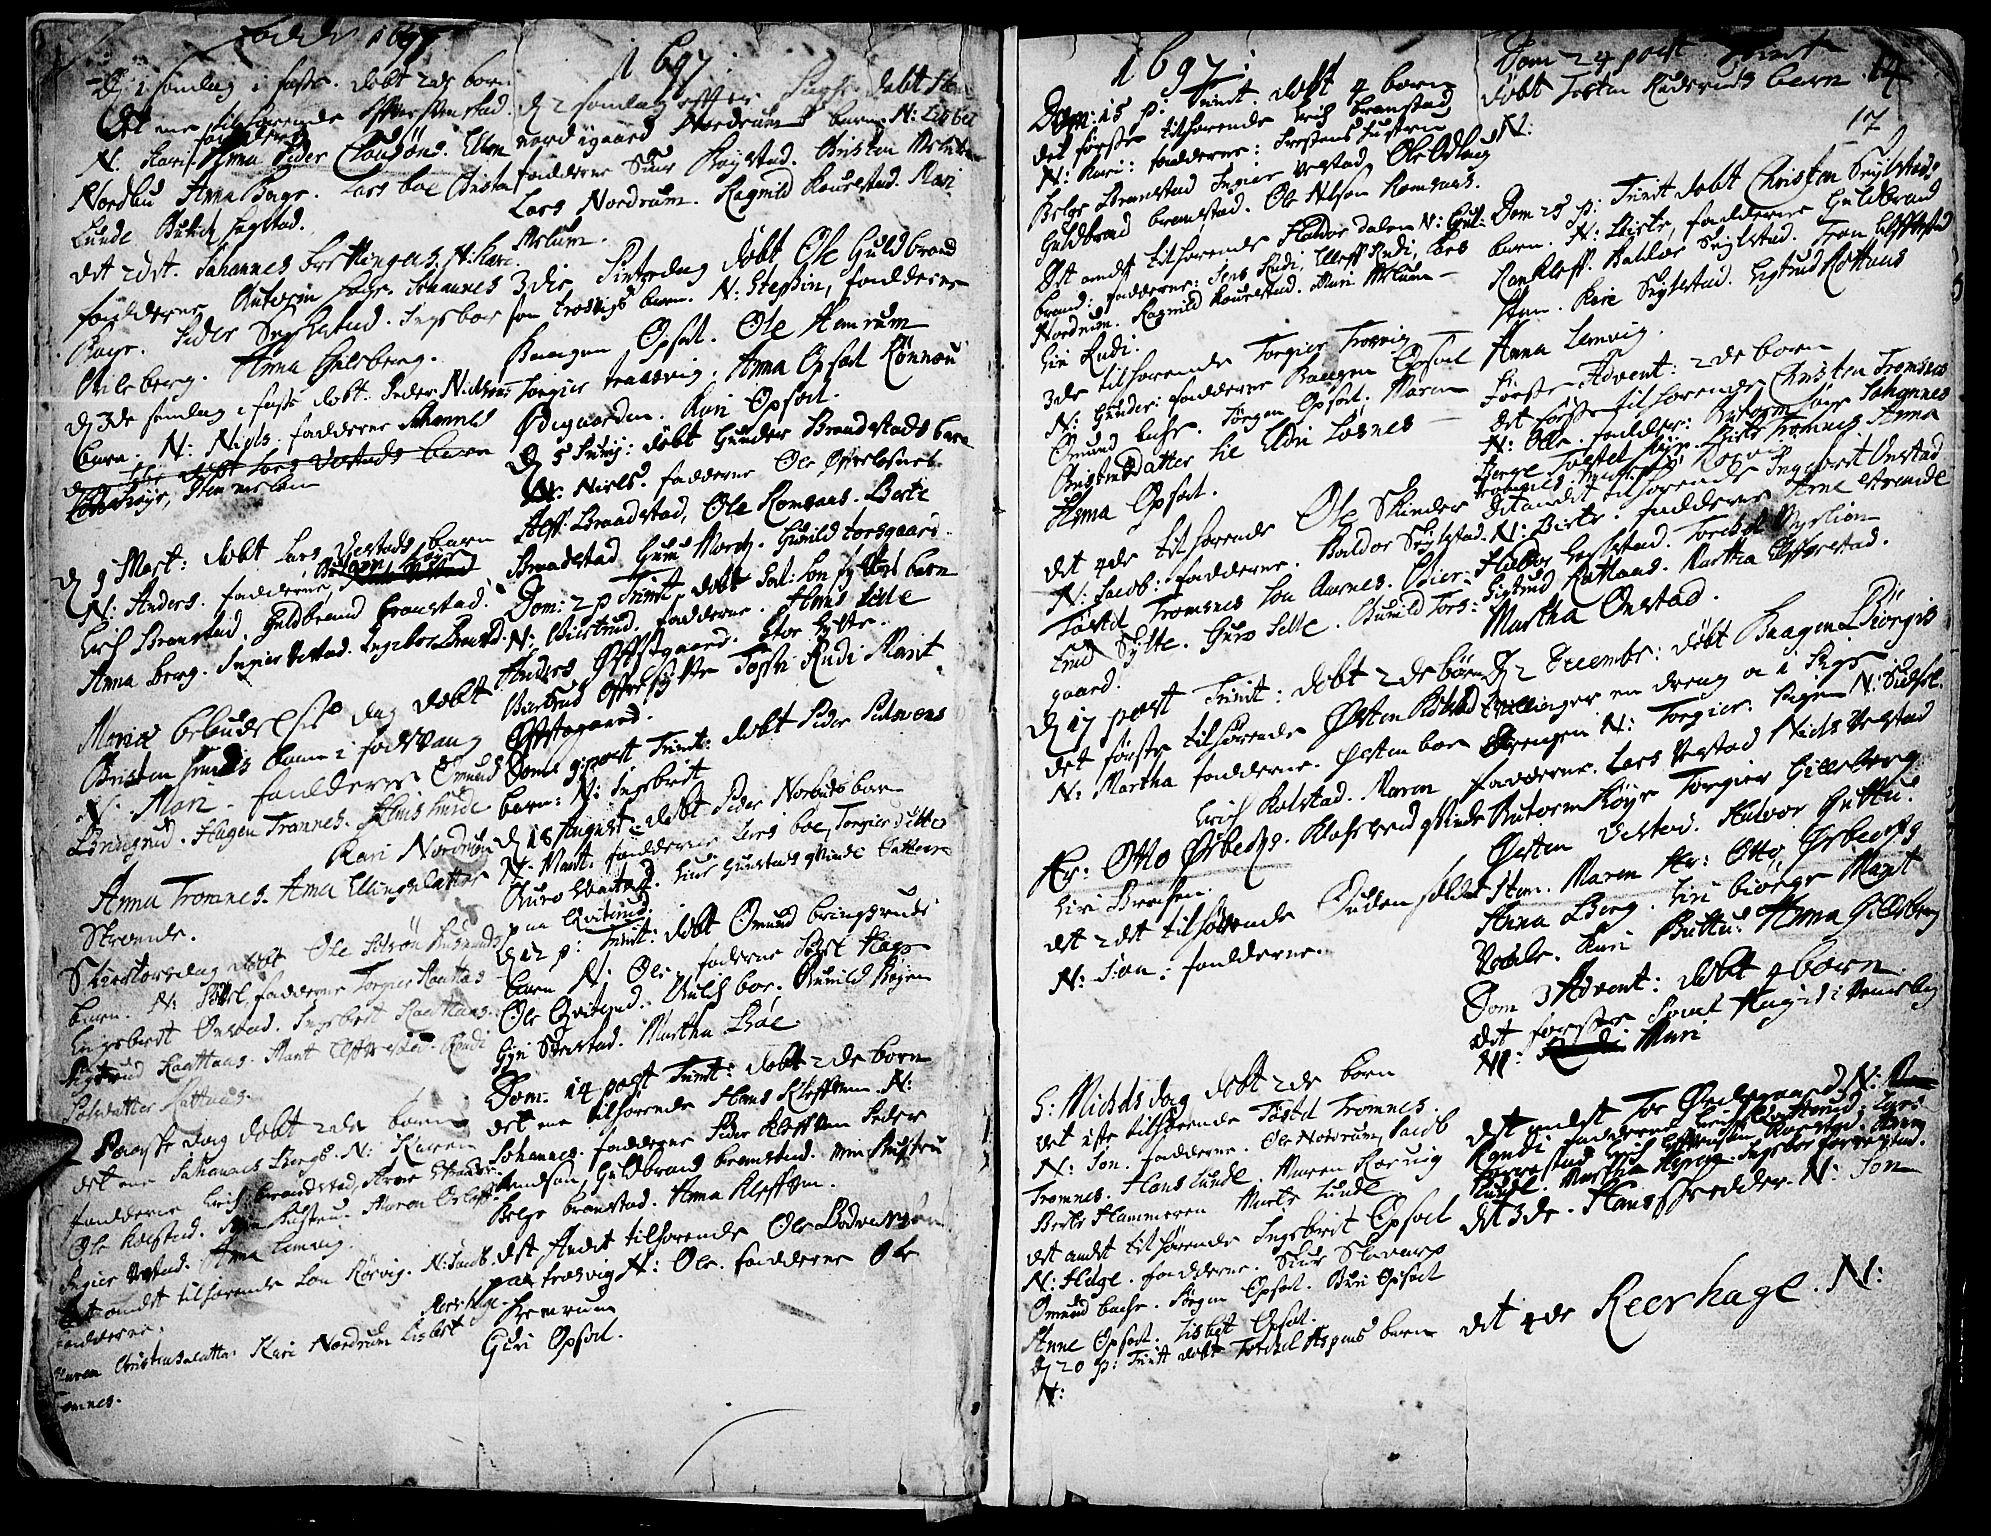 SAH, Ringebu prestekontor, Ministerialbok nr. 1, 1696-1733, s. 16-17